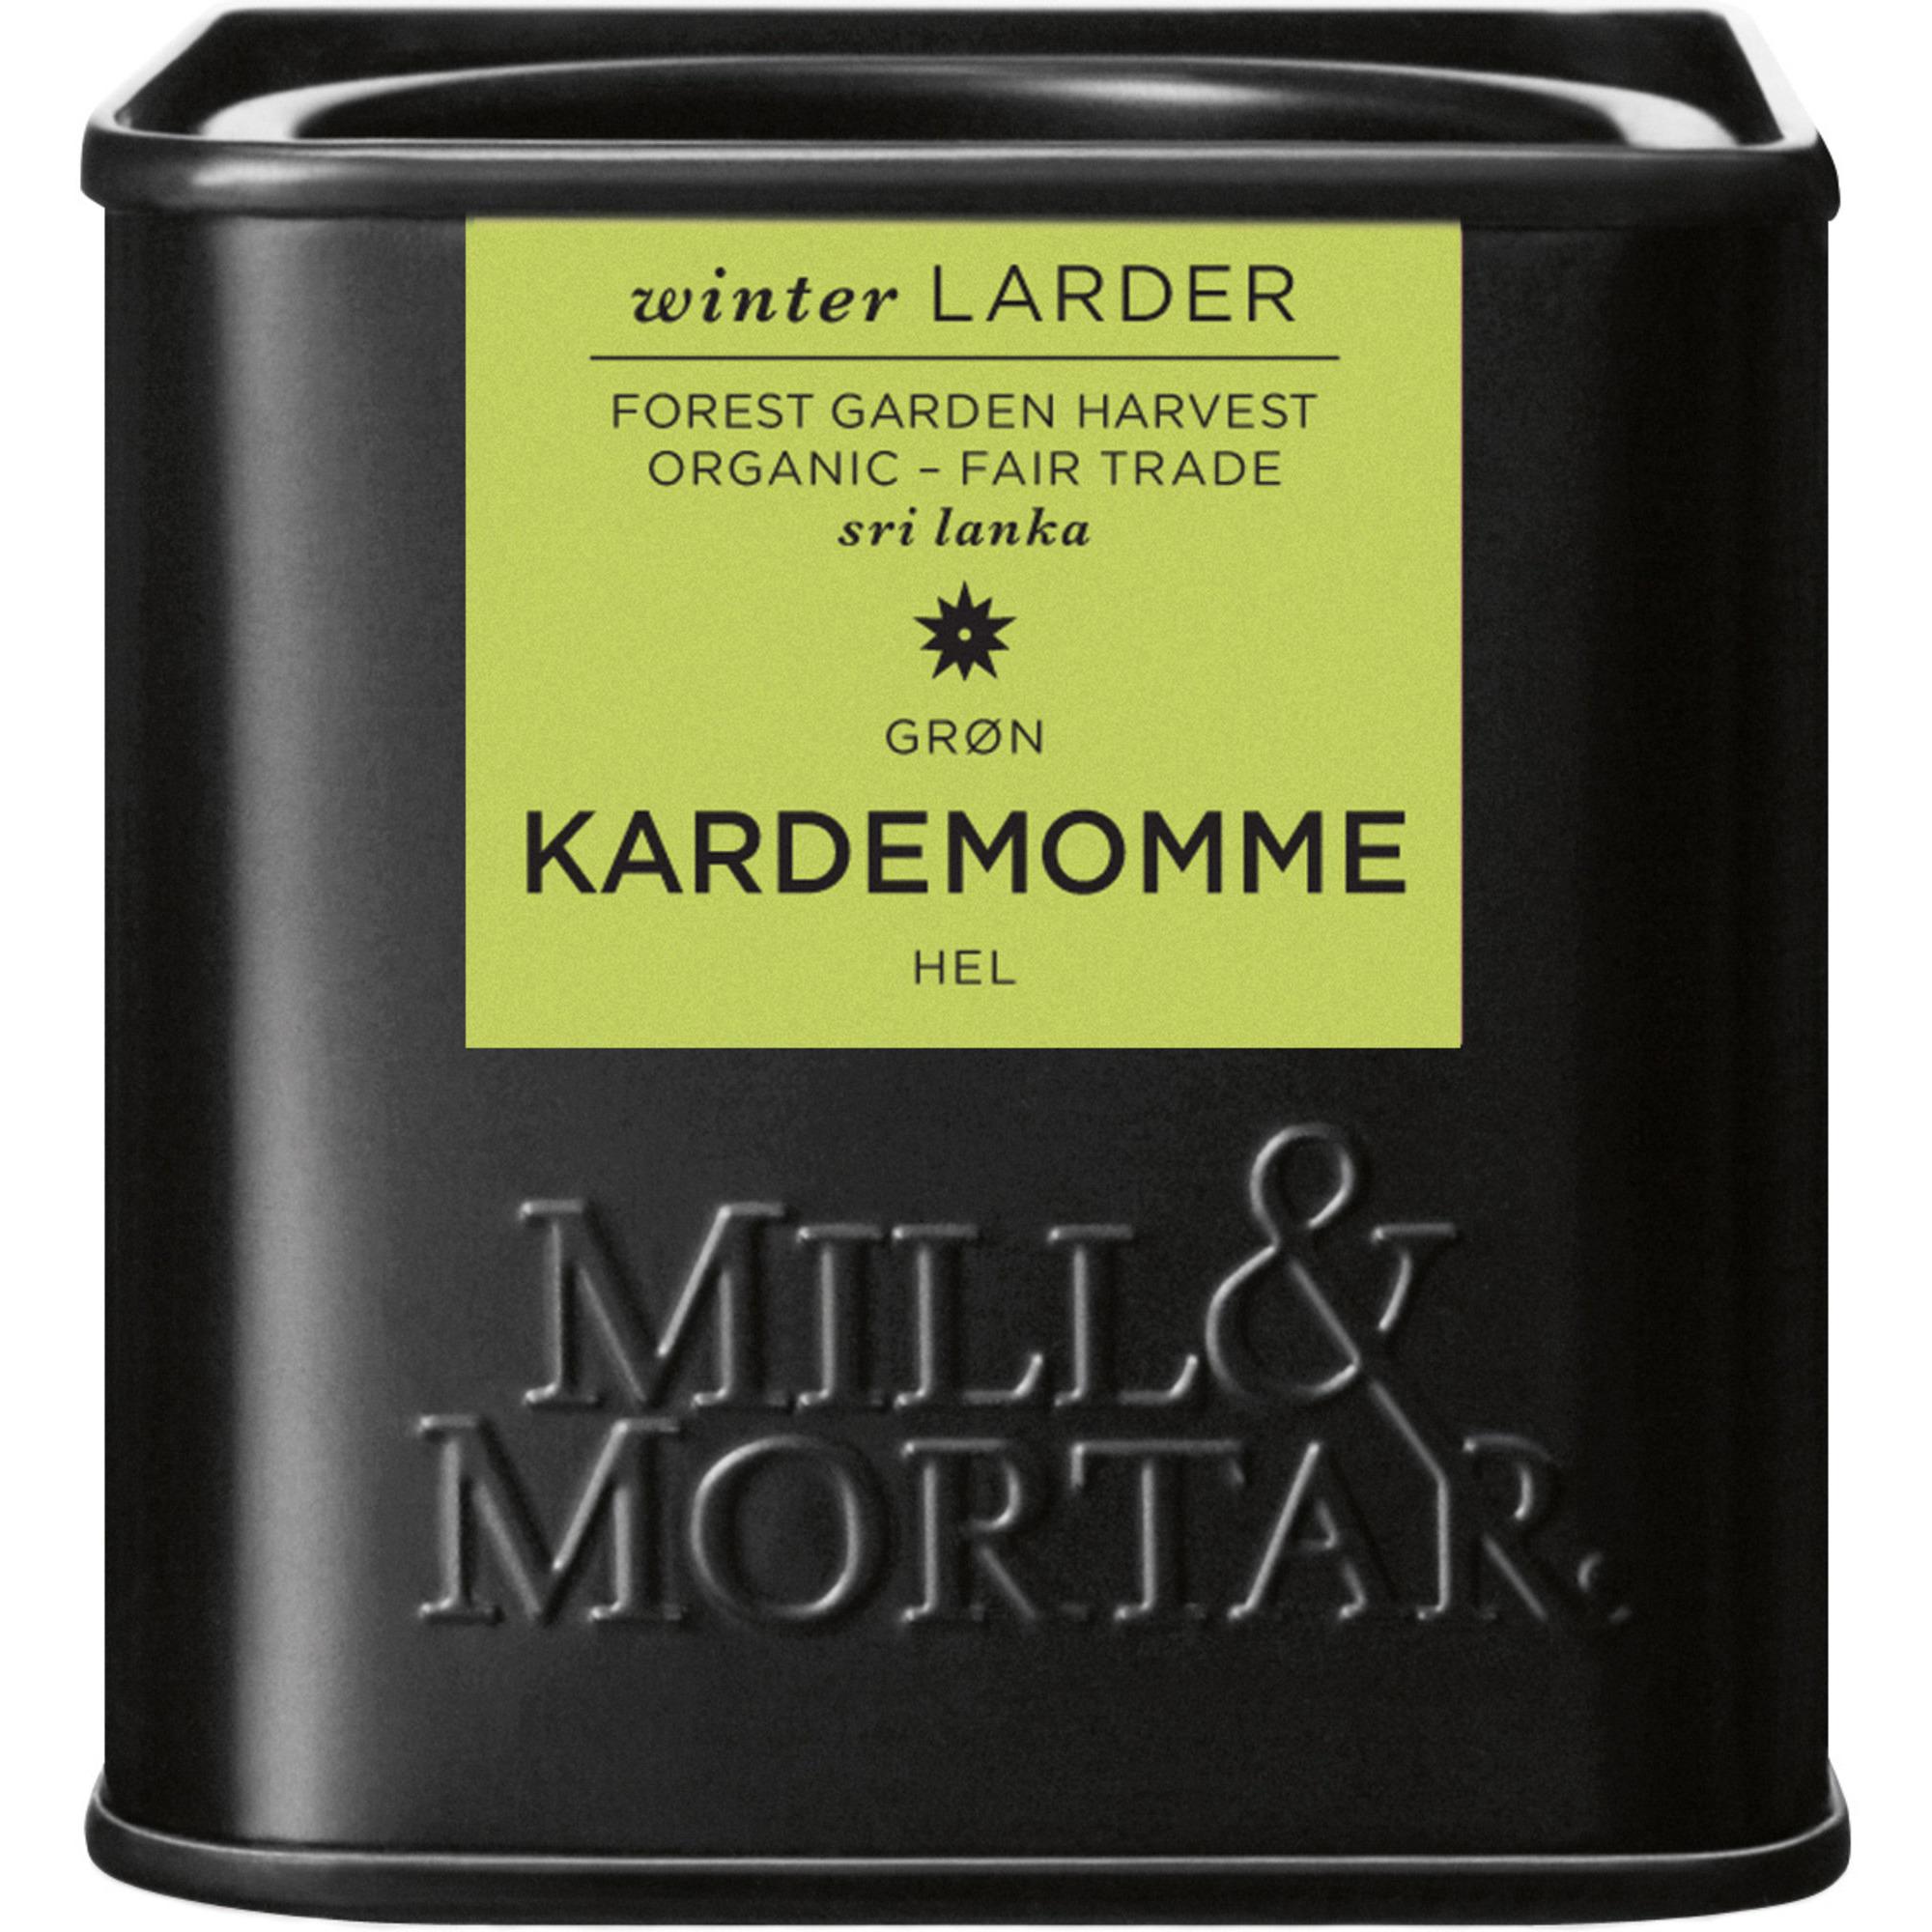 Mill & Mortar Kardemumma hel grön 25 g